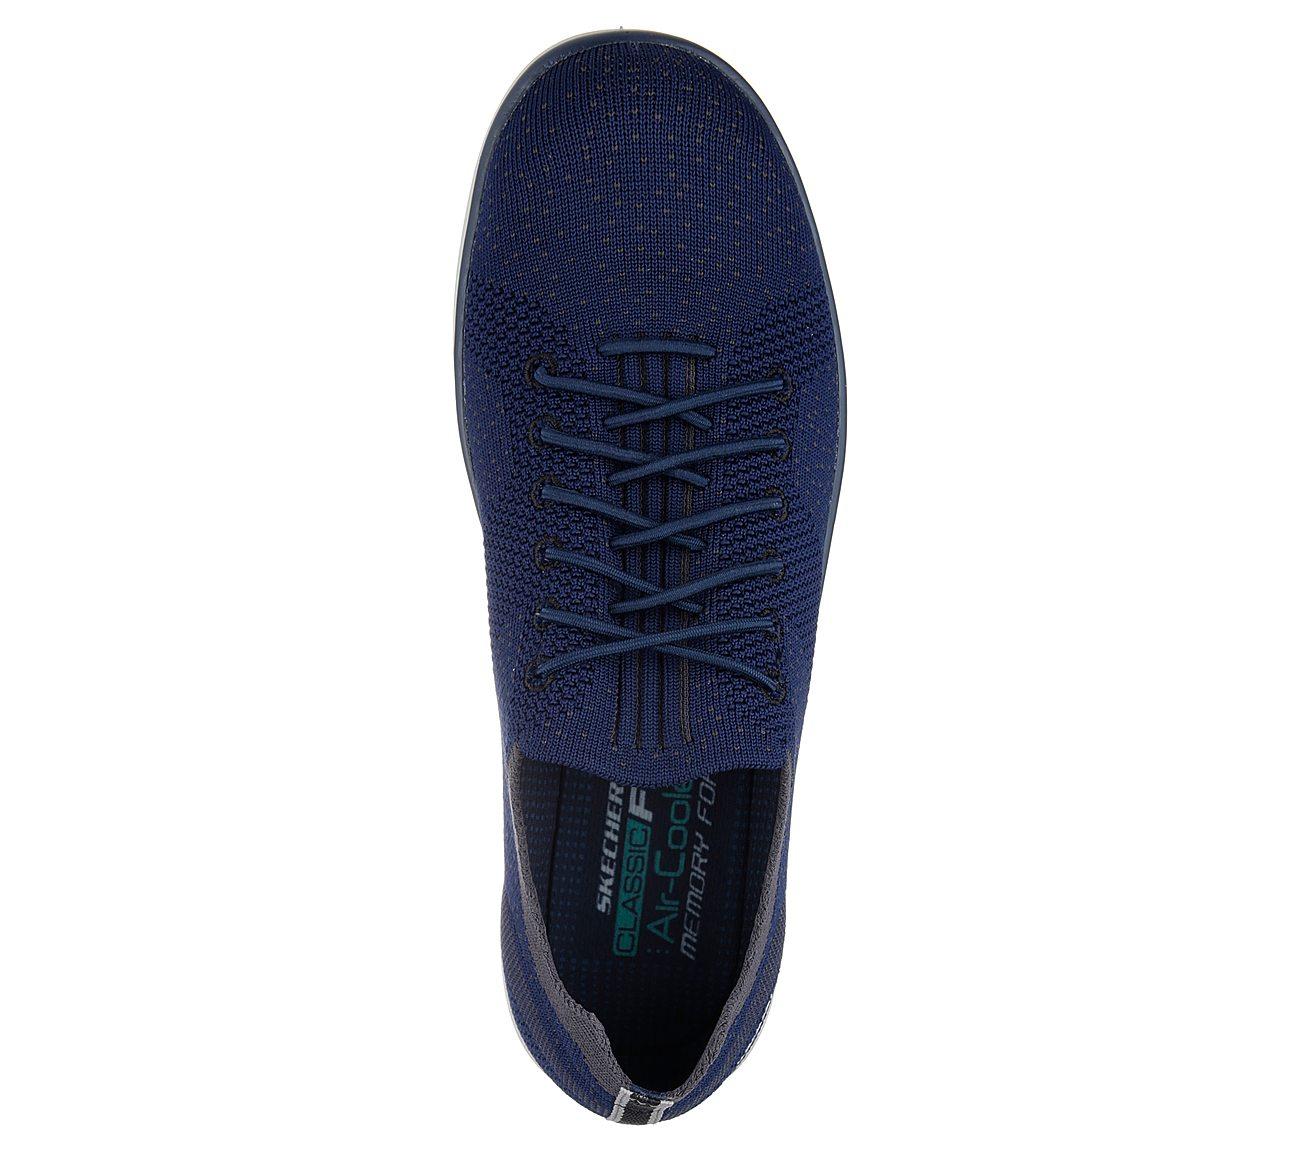 3121a9d7dfba Buy SKECHERS Boyar - Molsen USA Casuals Shoes only  80.00